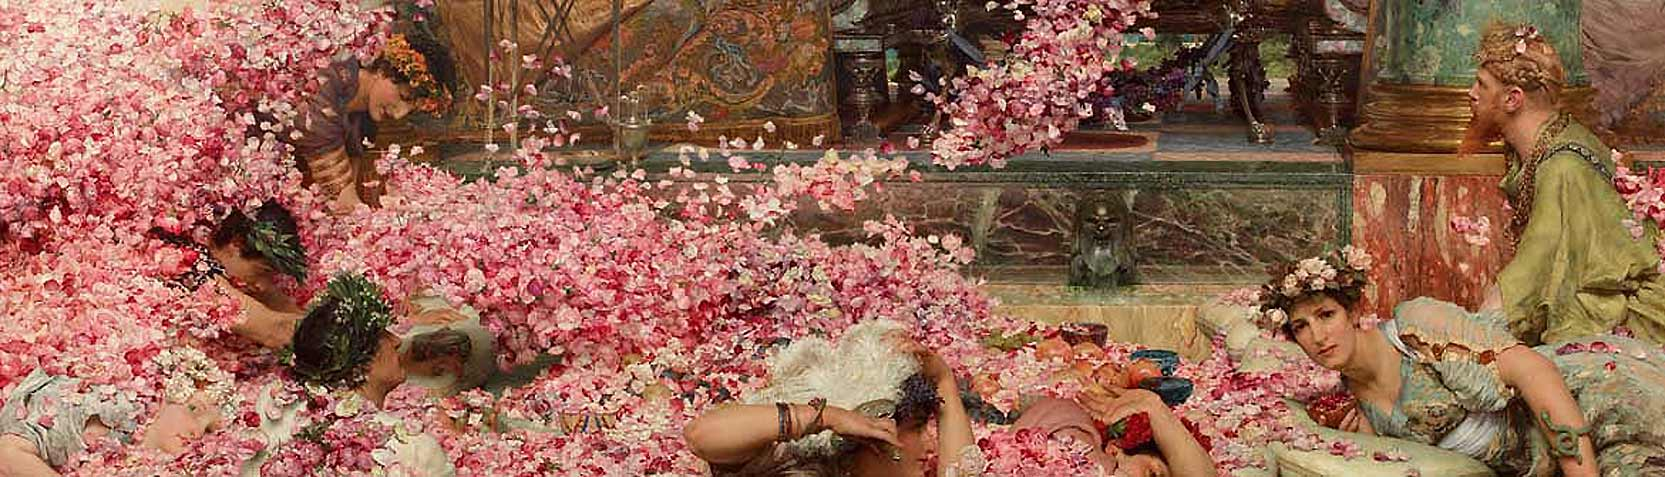 Artistas - Sir Lawrence Alma-Tadema